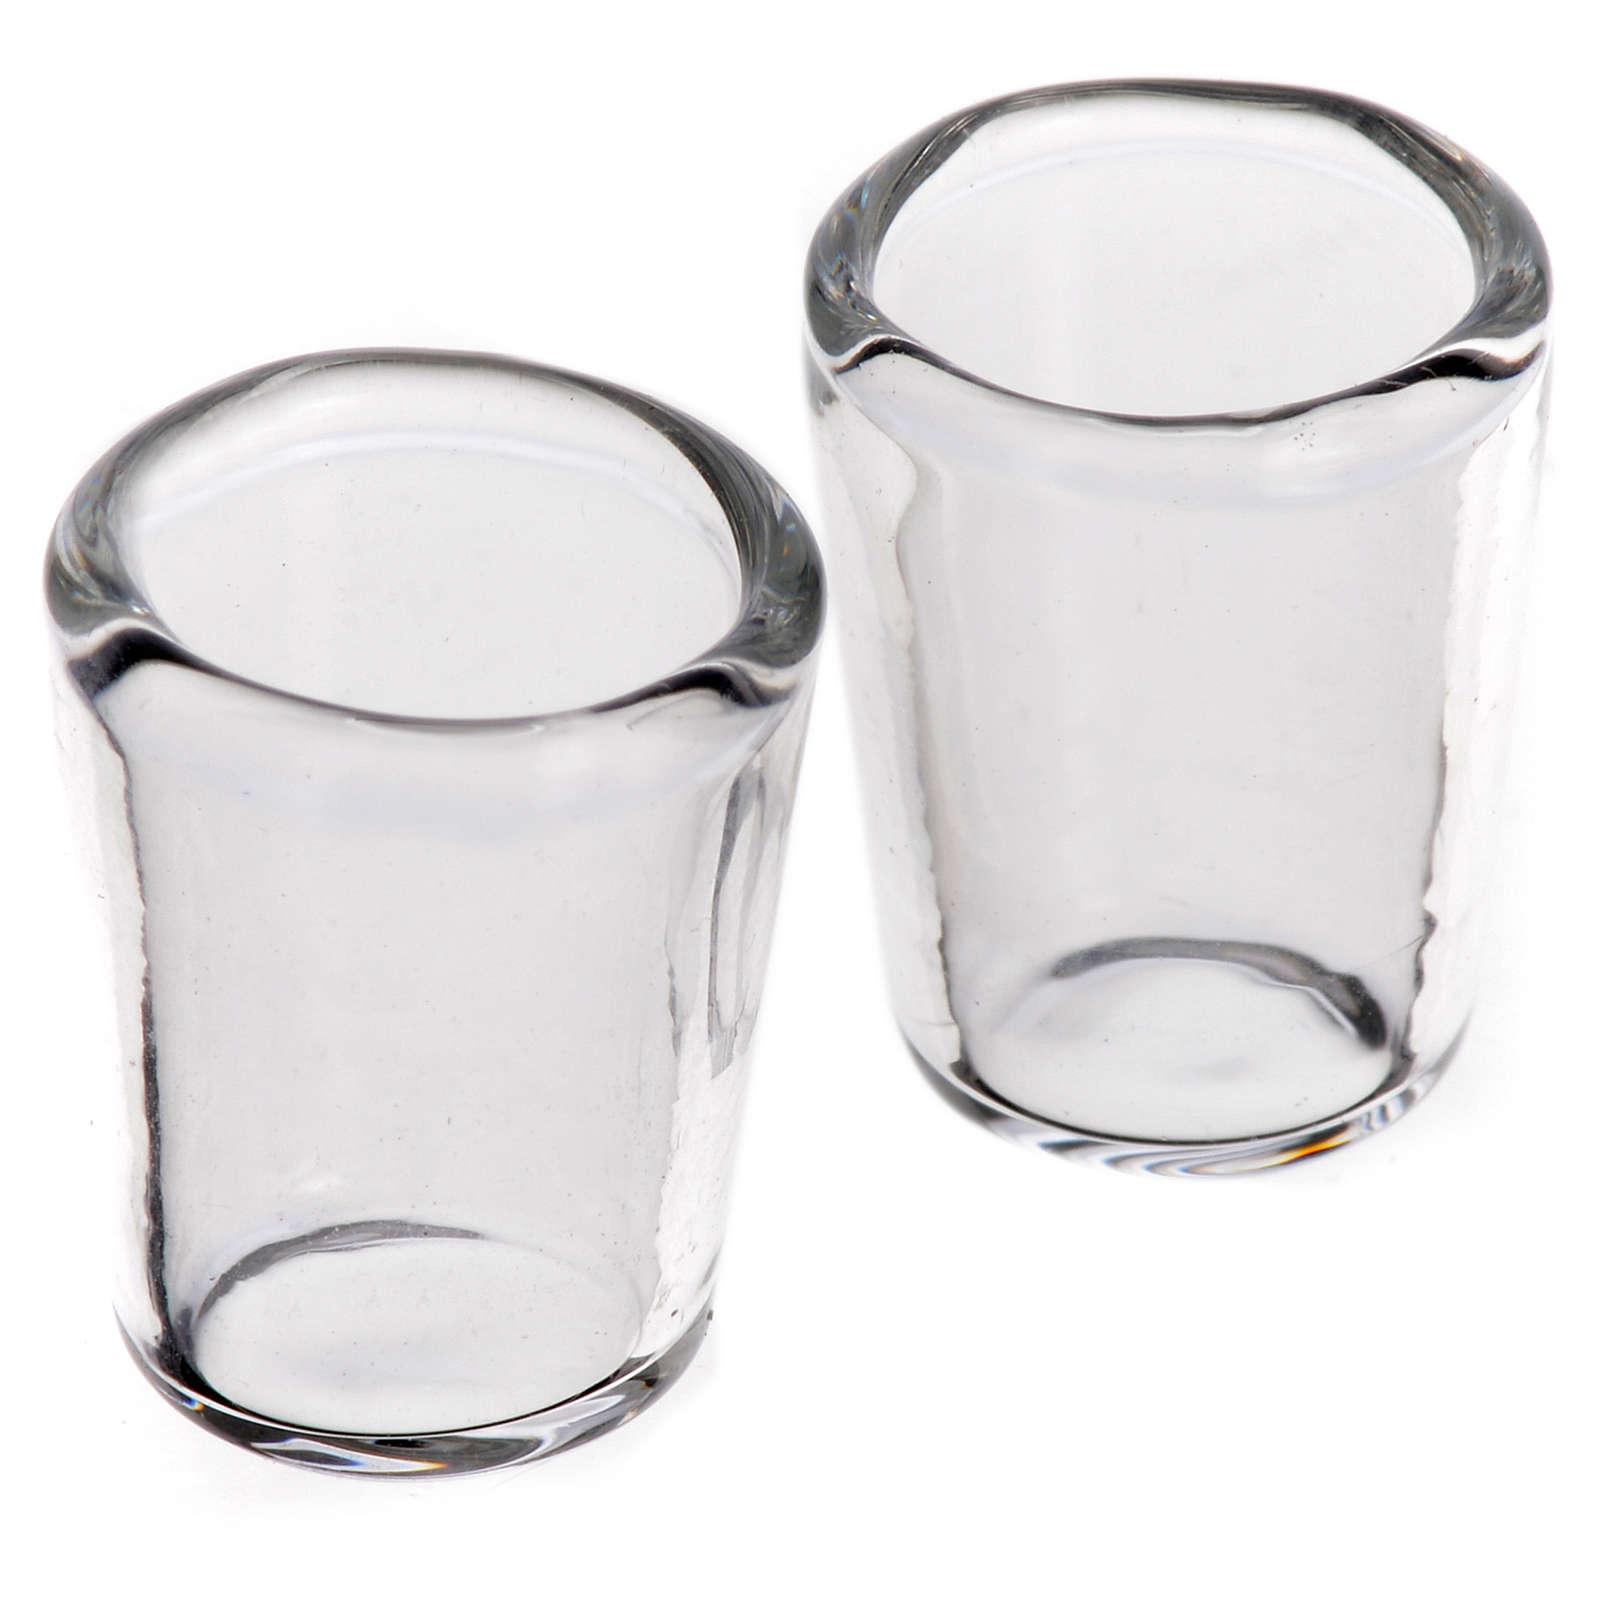 Bicchiere vetro presepe 1,3x1 cm set 2 pz 4